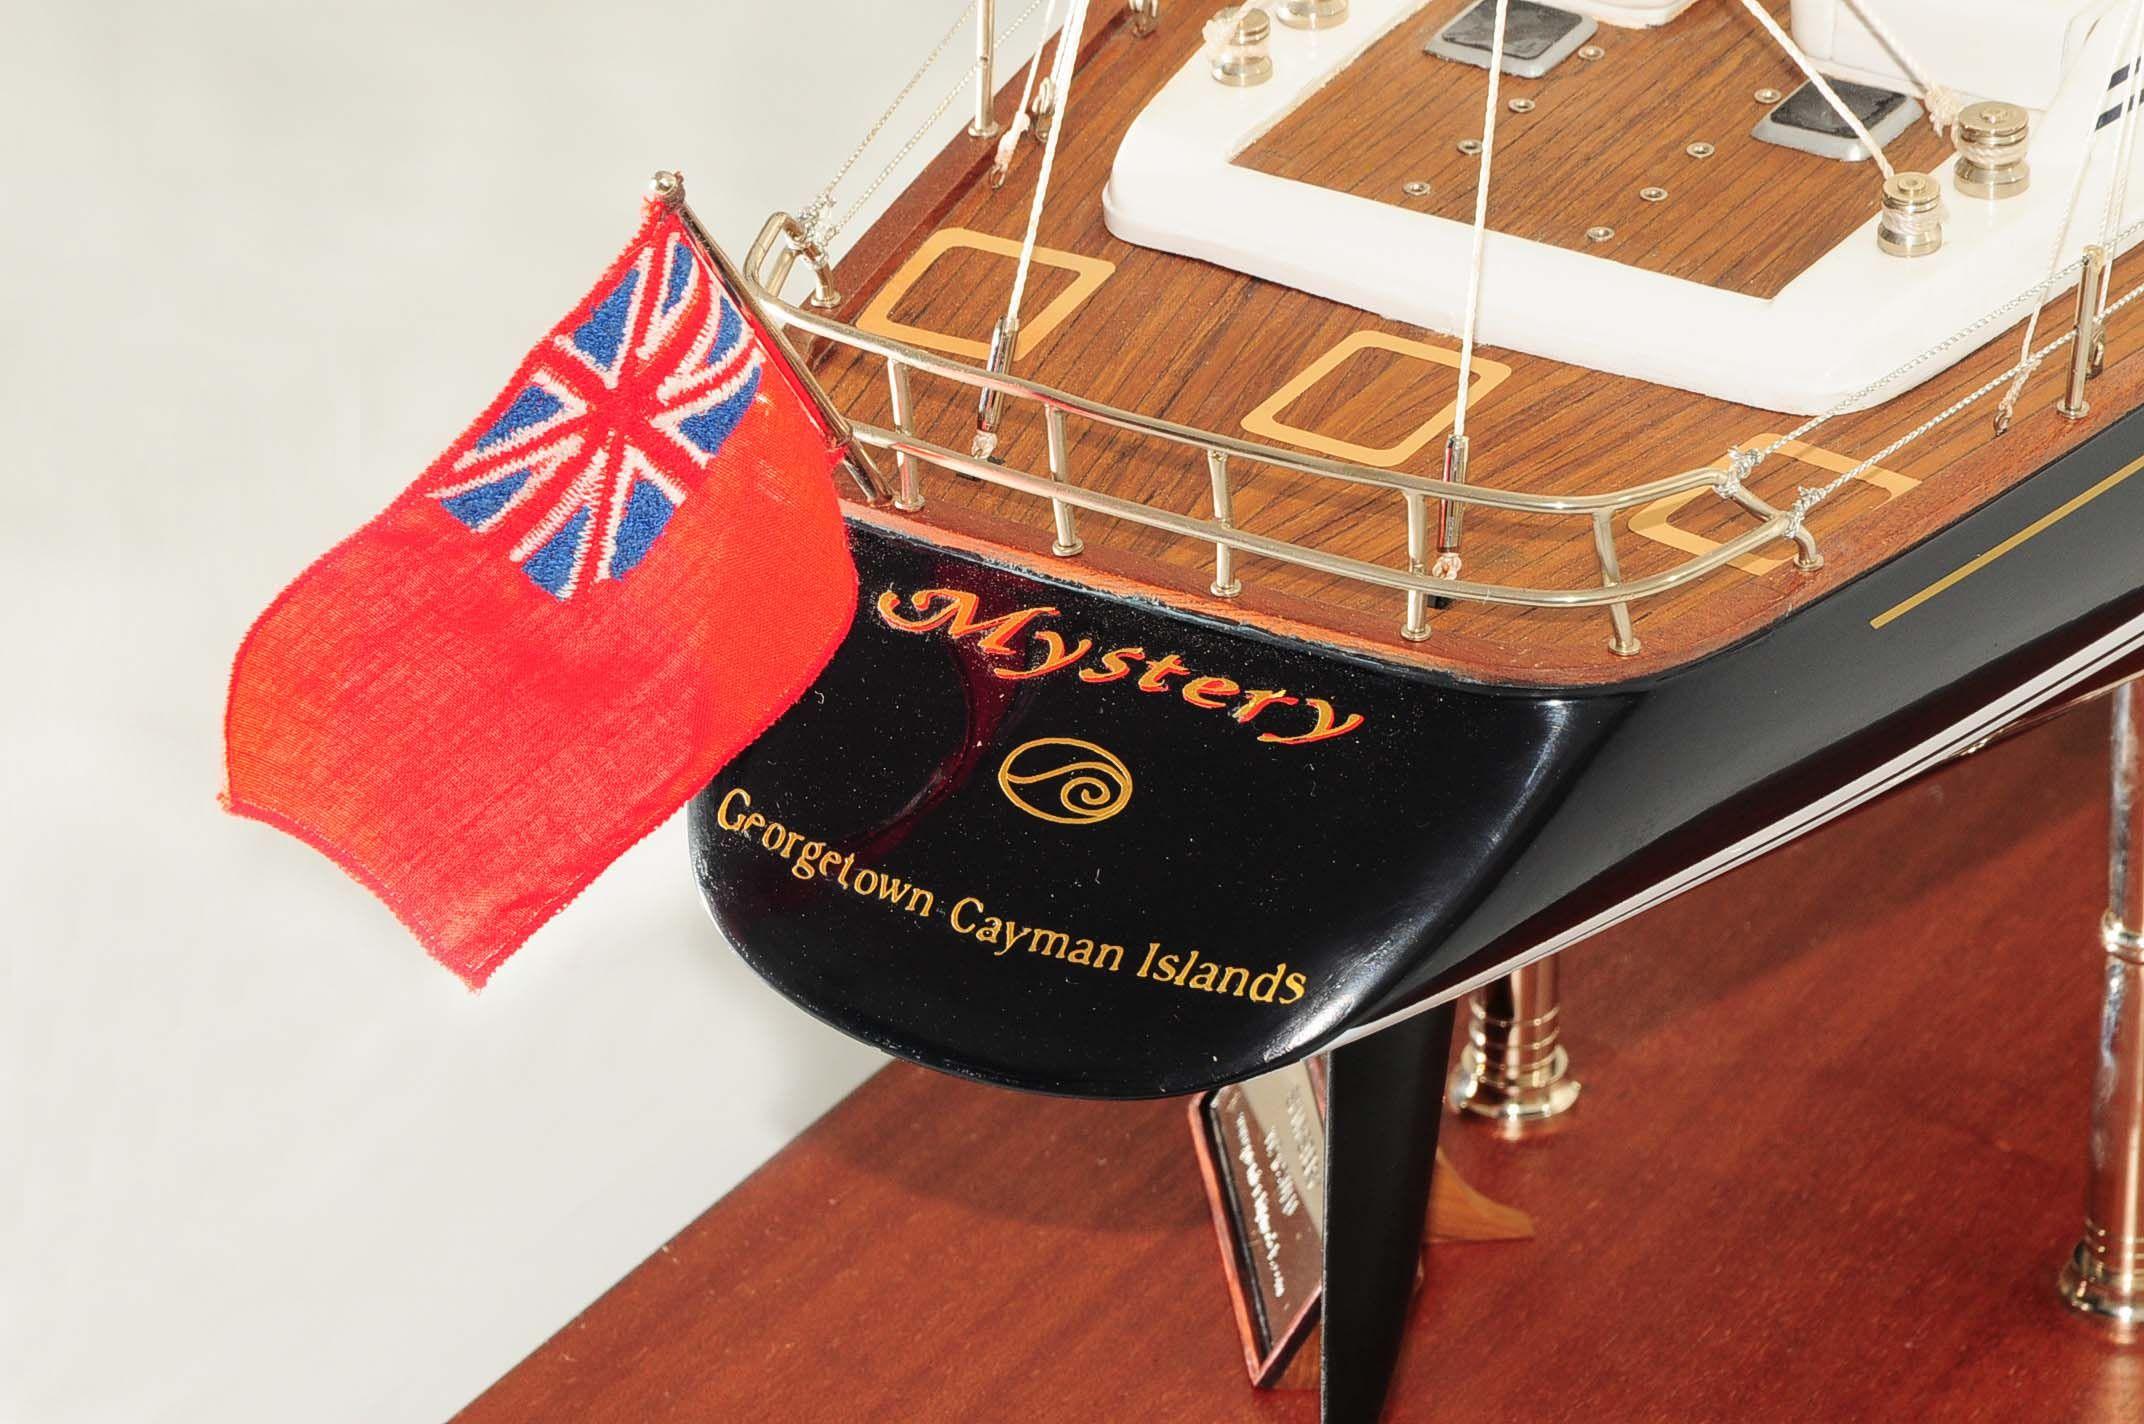 709-6076-Mystery-Model-Yacht